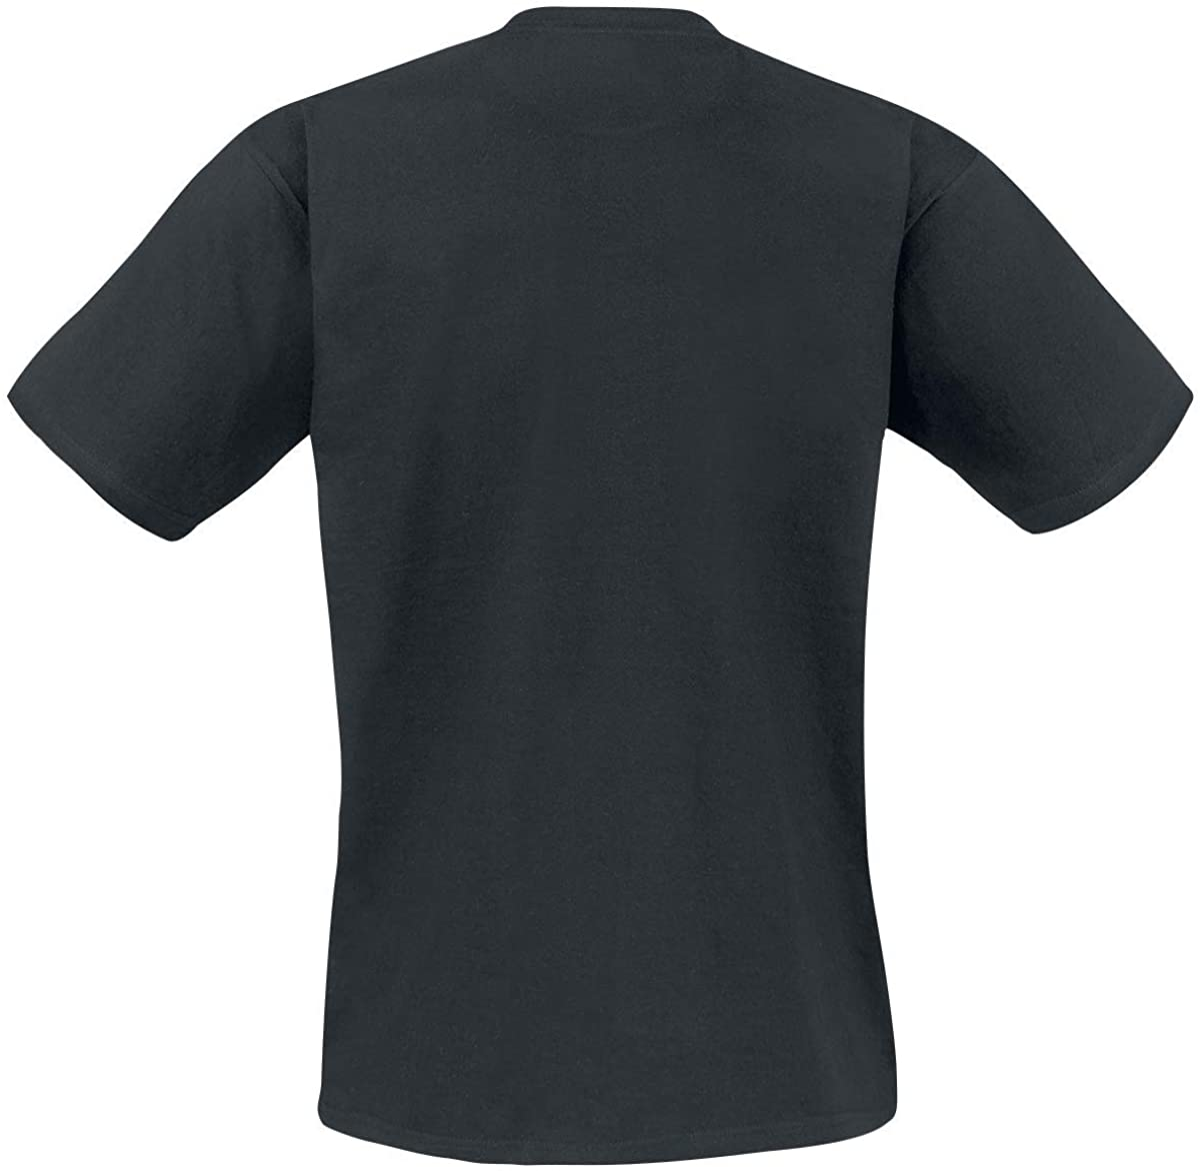 Queen Germany Tour 79 T-Shirt schwarz